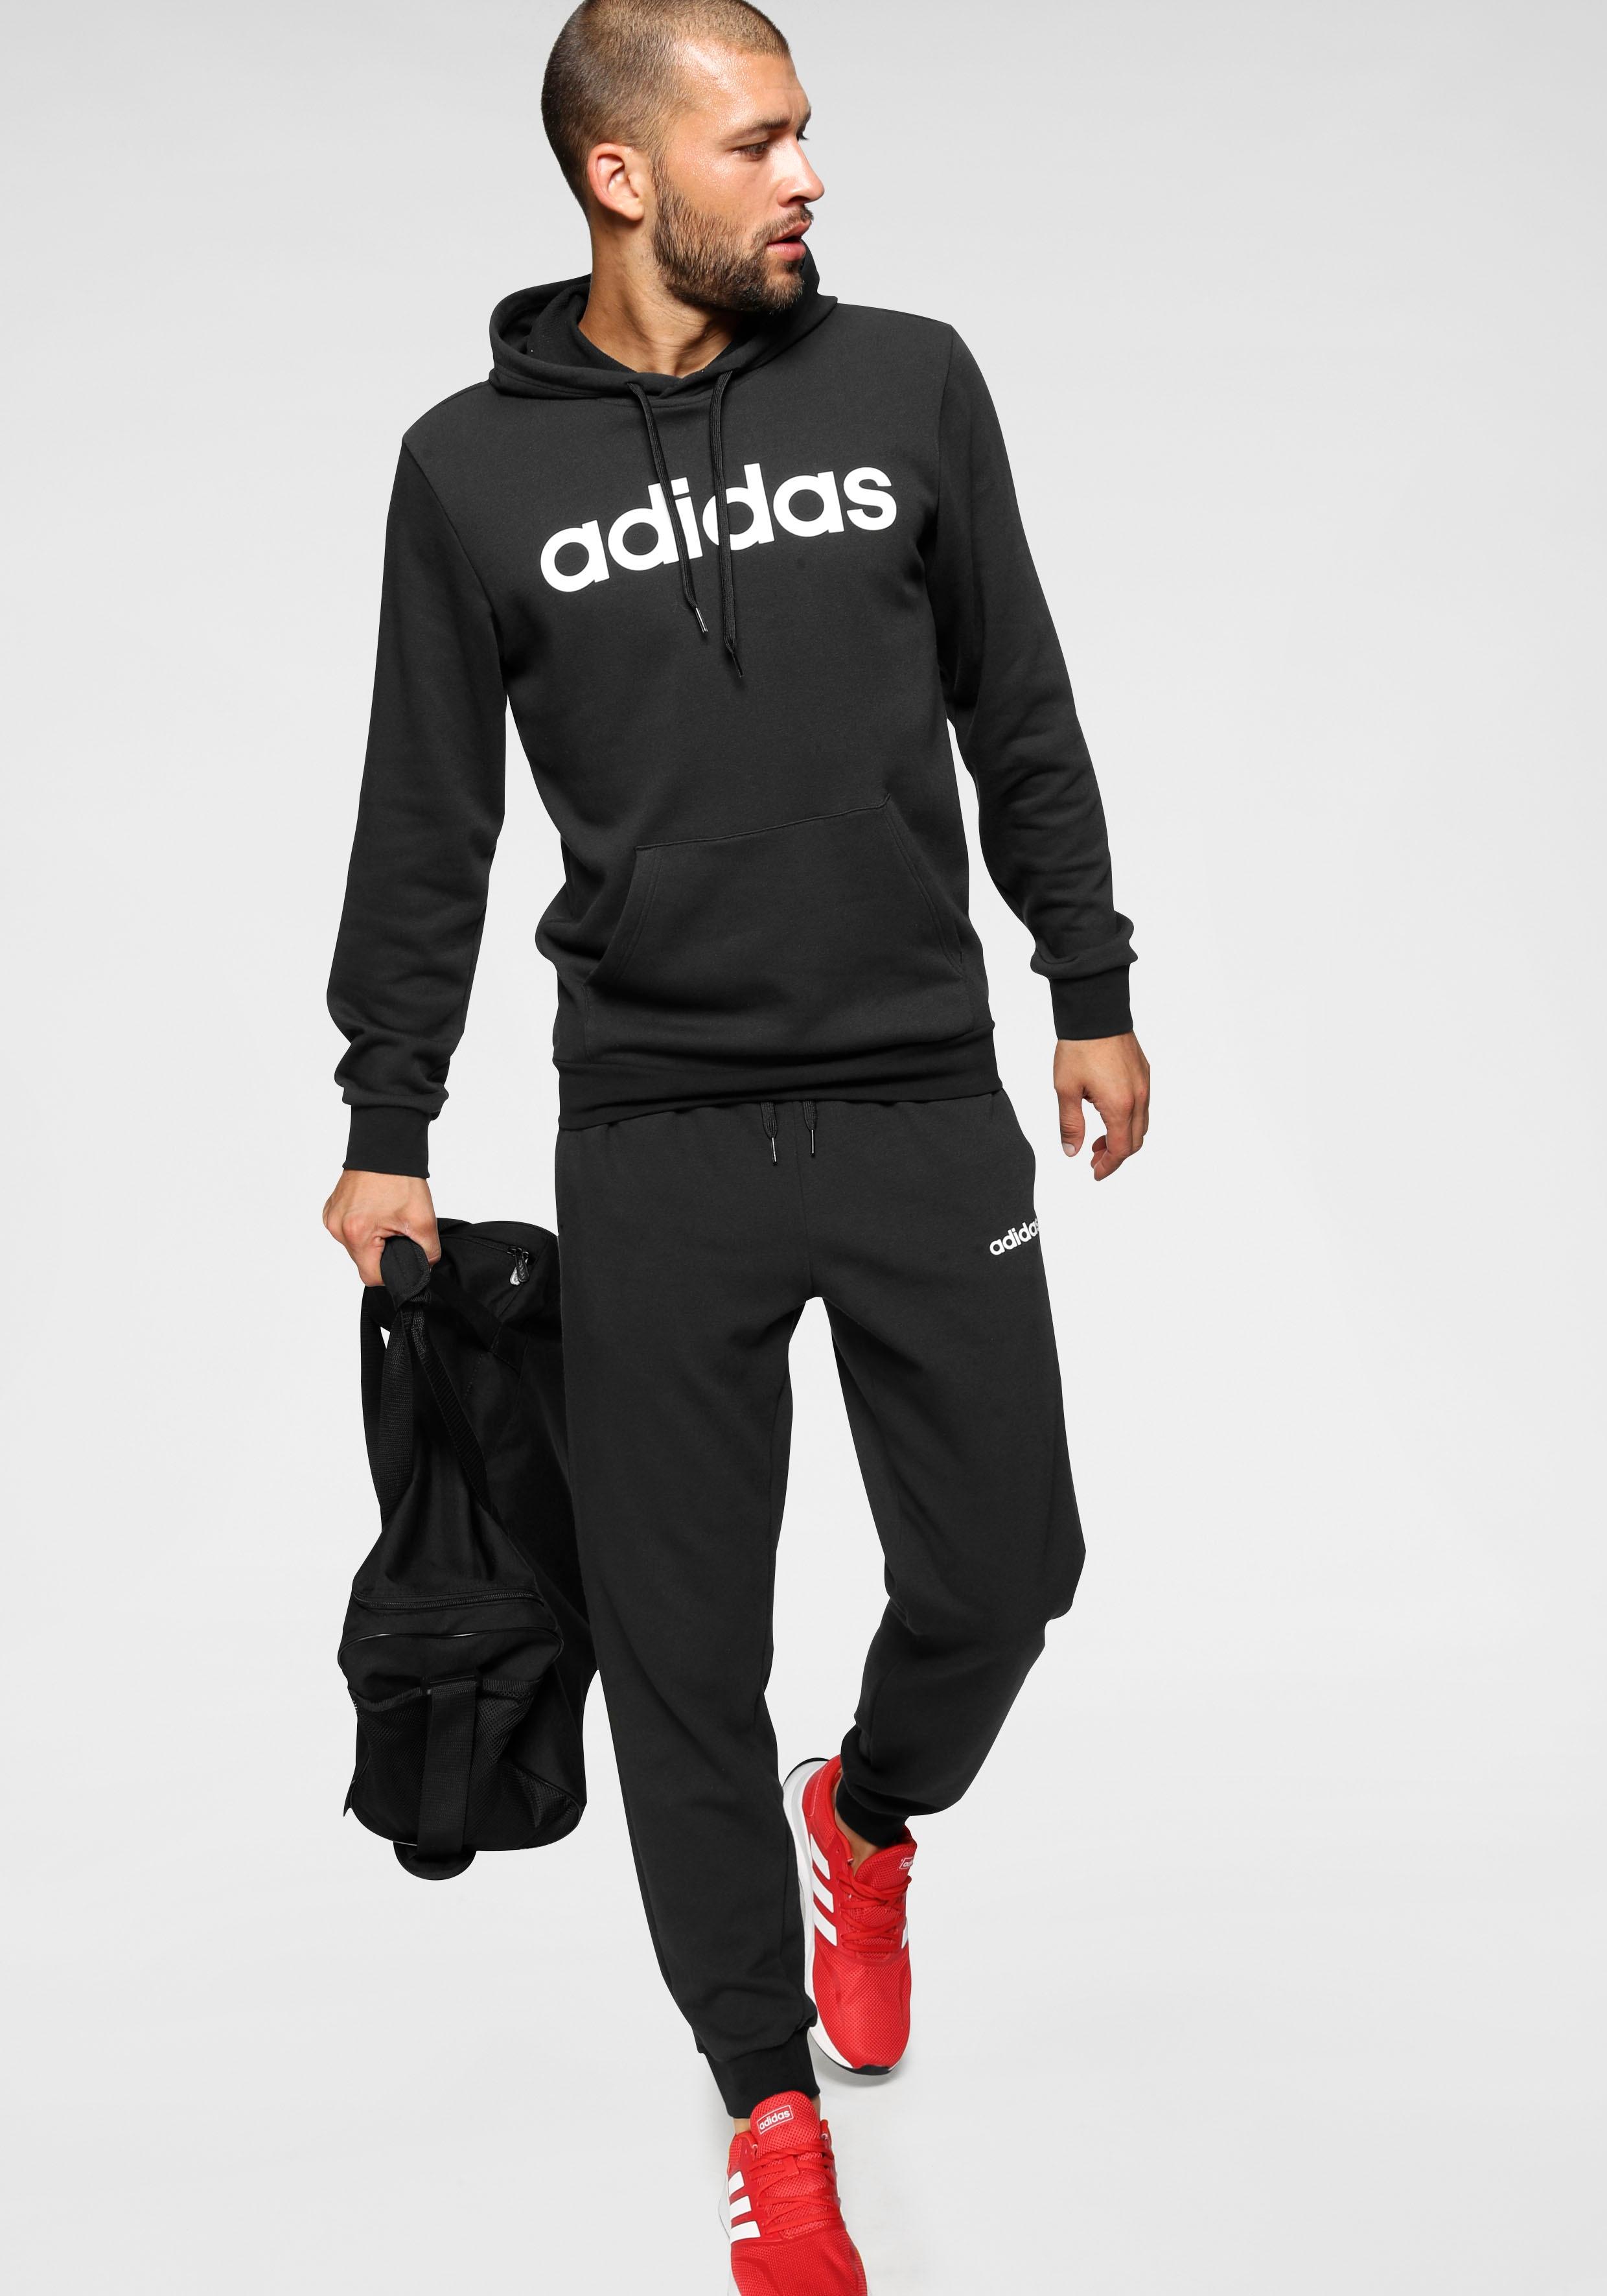 adidas Performance Jogginganzug MEN TRACKSUITCO HO (Set, 2 tlg.) | Sportbekleidung > Sportanzüge > Jogginganzüge | adidas performance